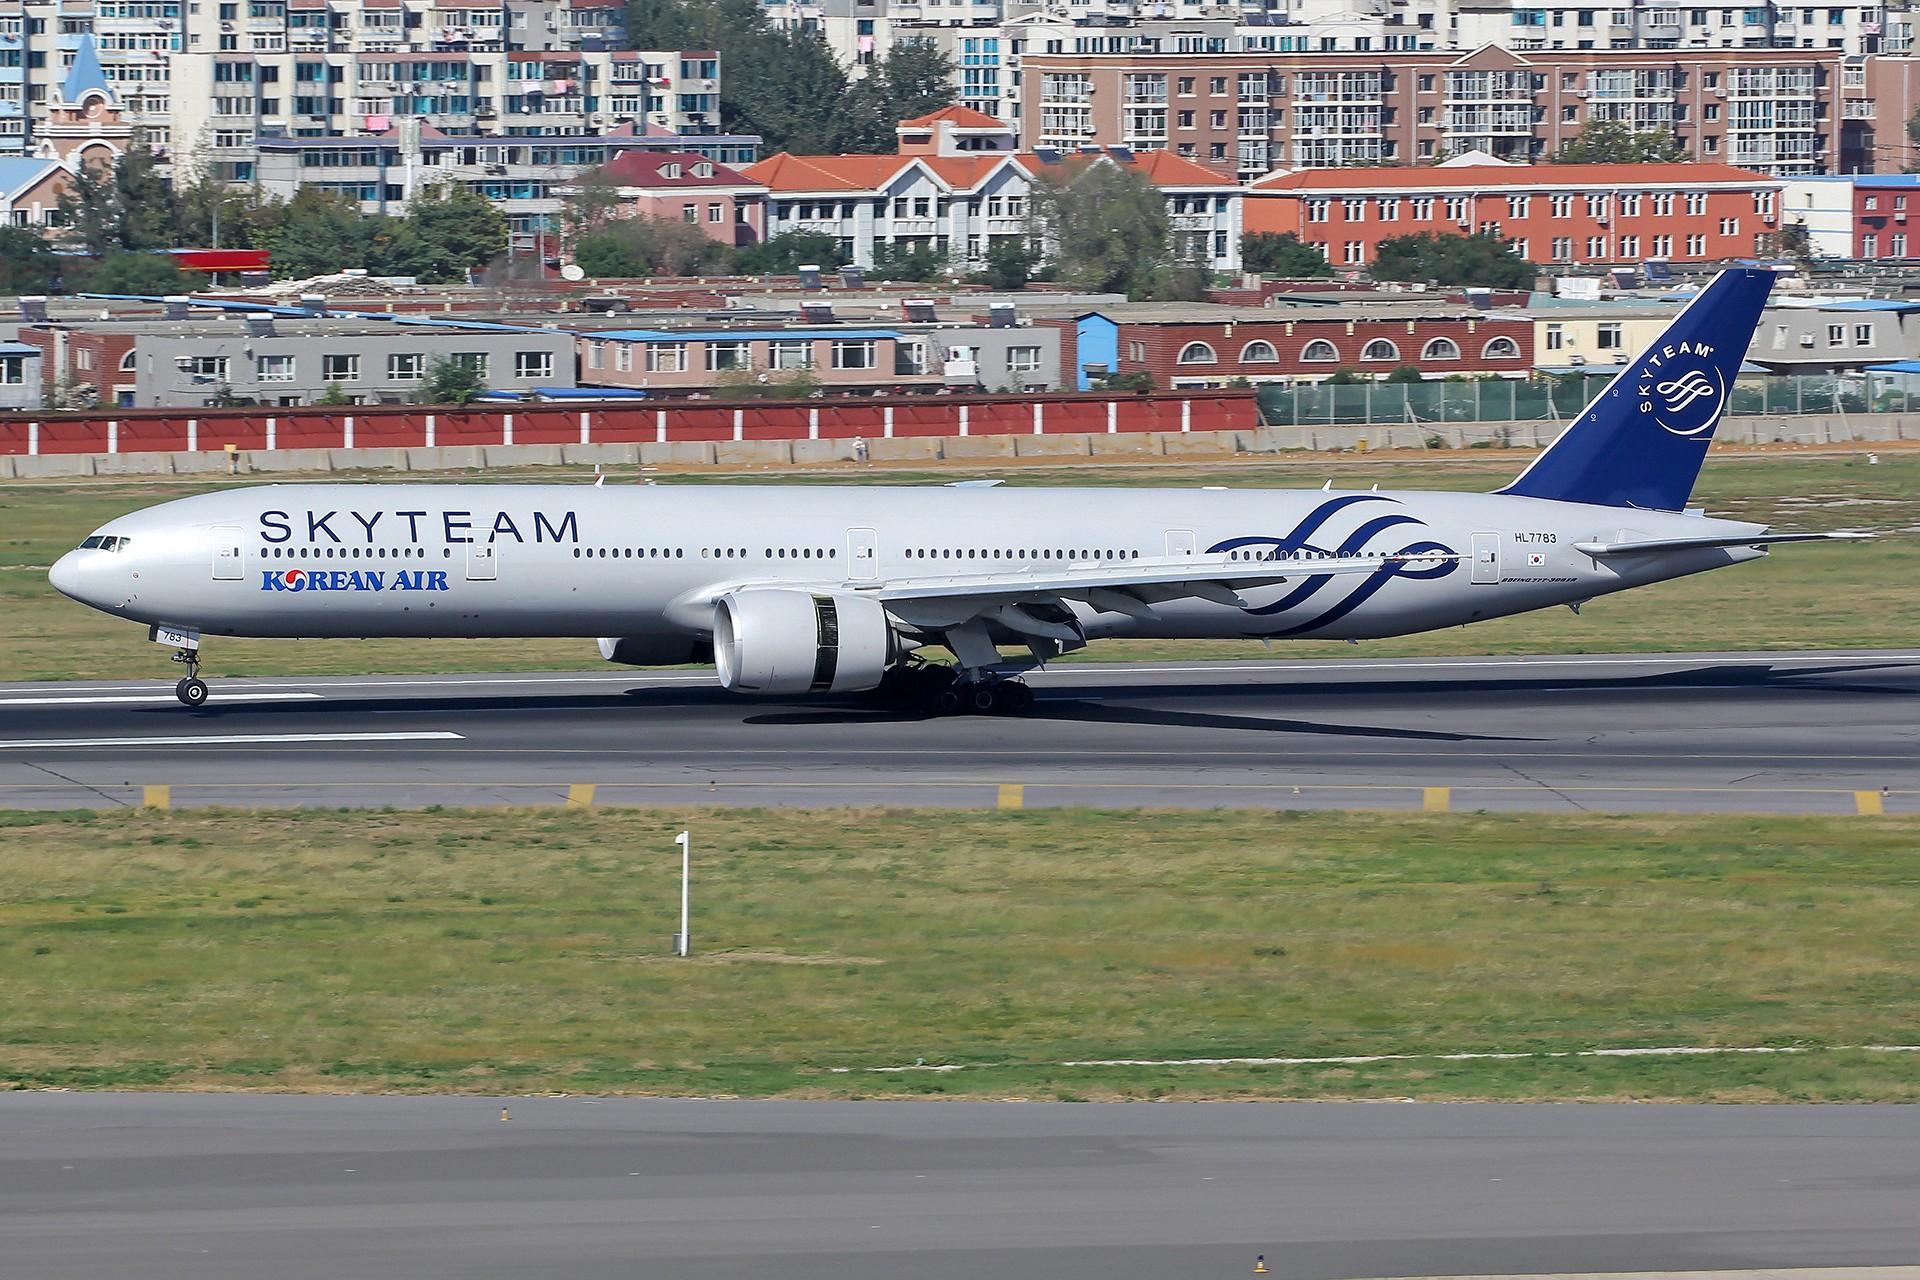 Re:[DLC]。。。三架飞机两个联盟 。。。 BOEING 777-300ER HL7783 中国大连国际机场